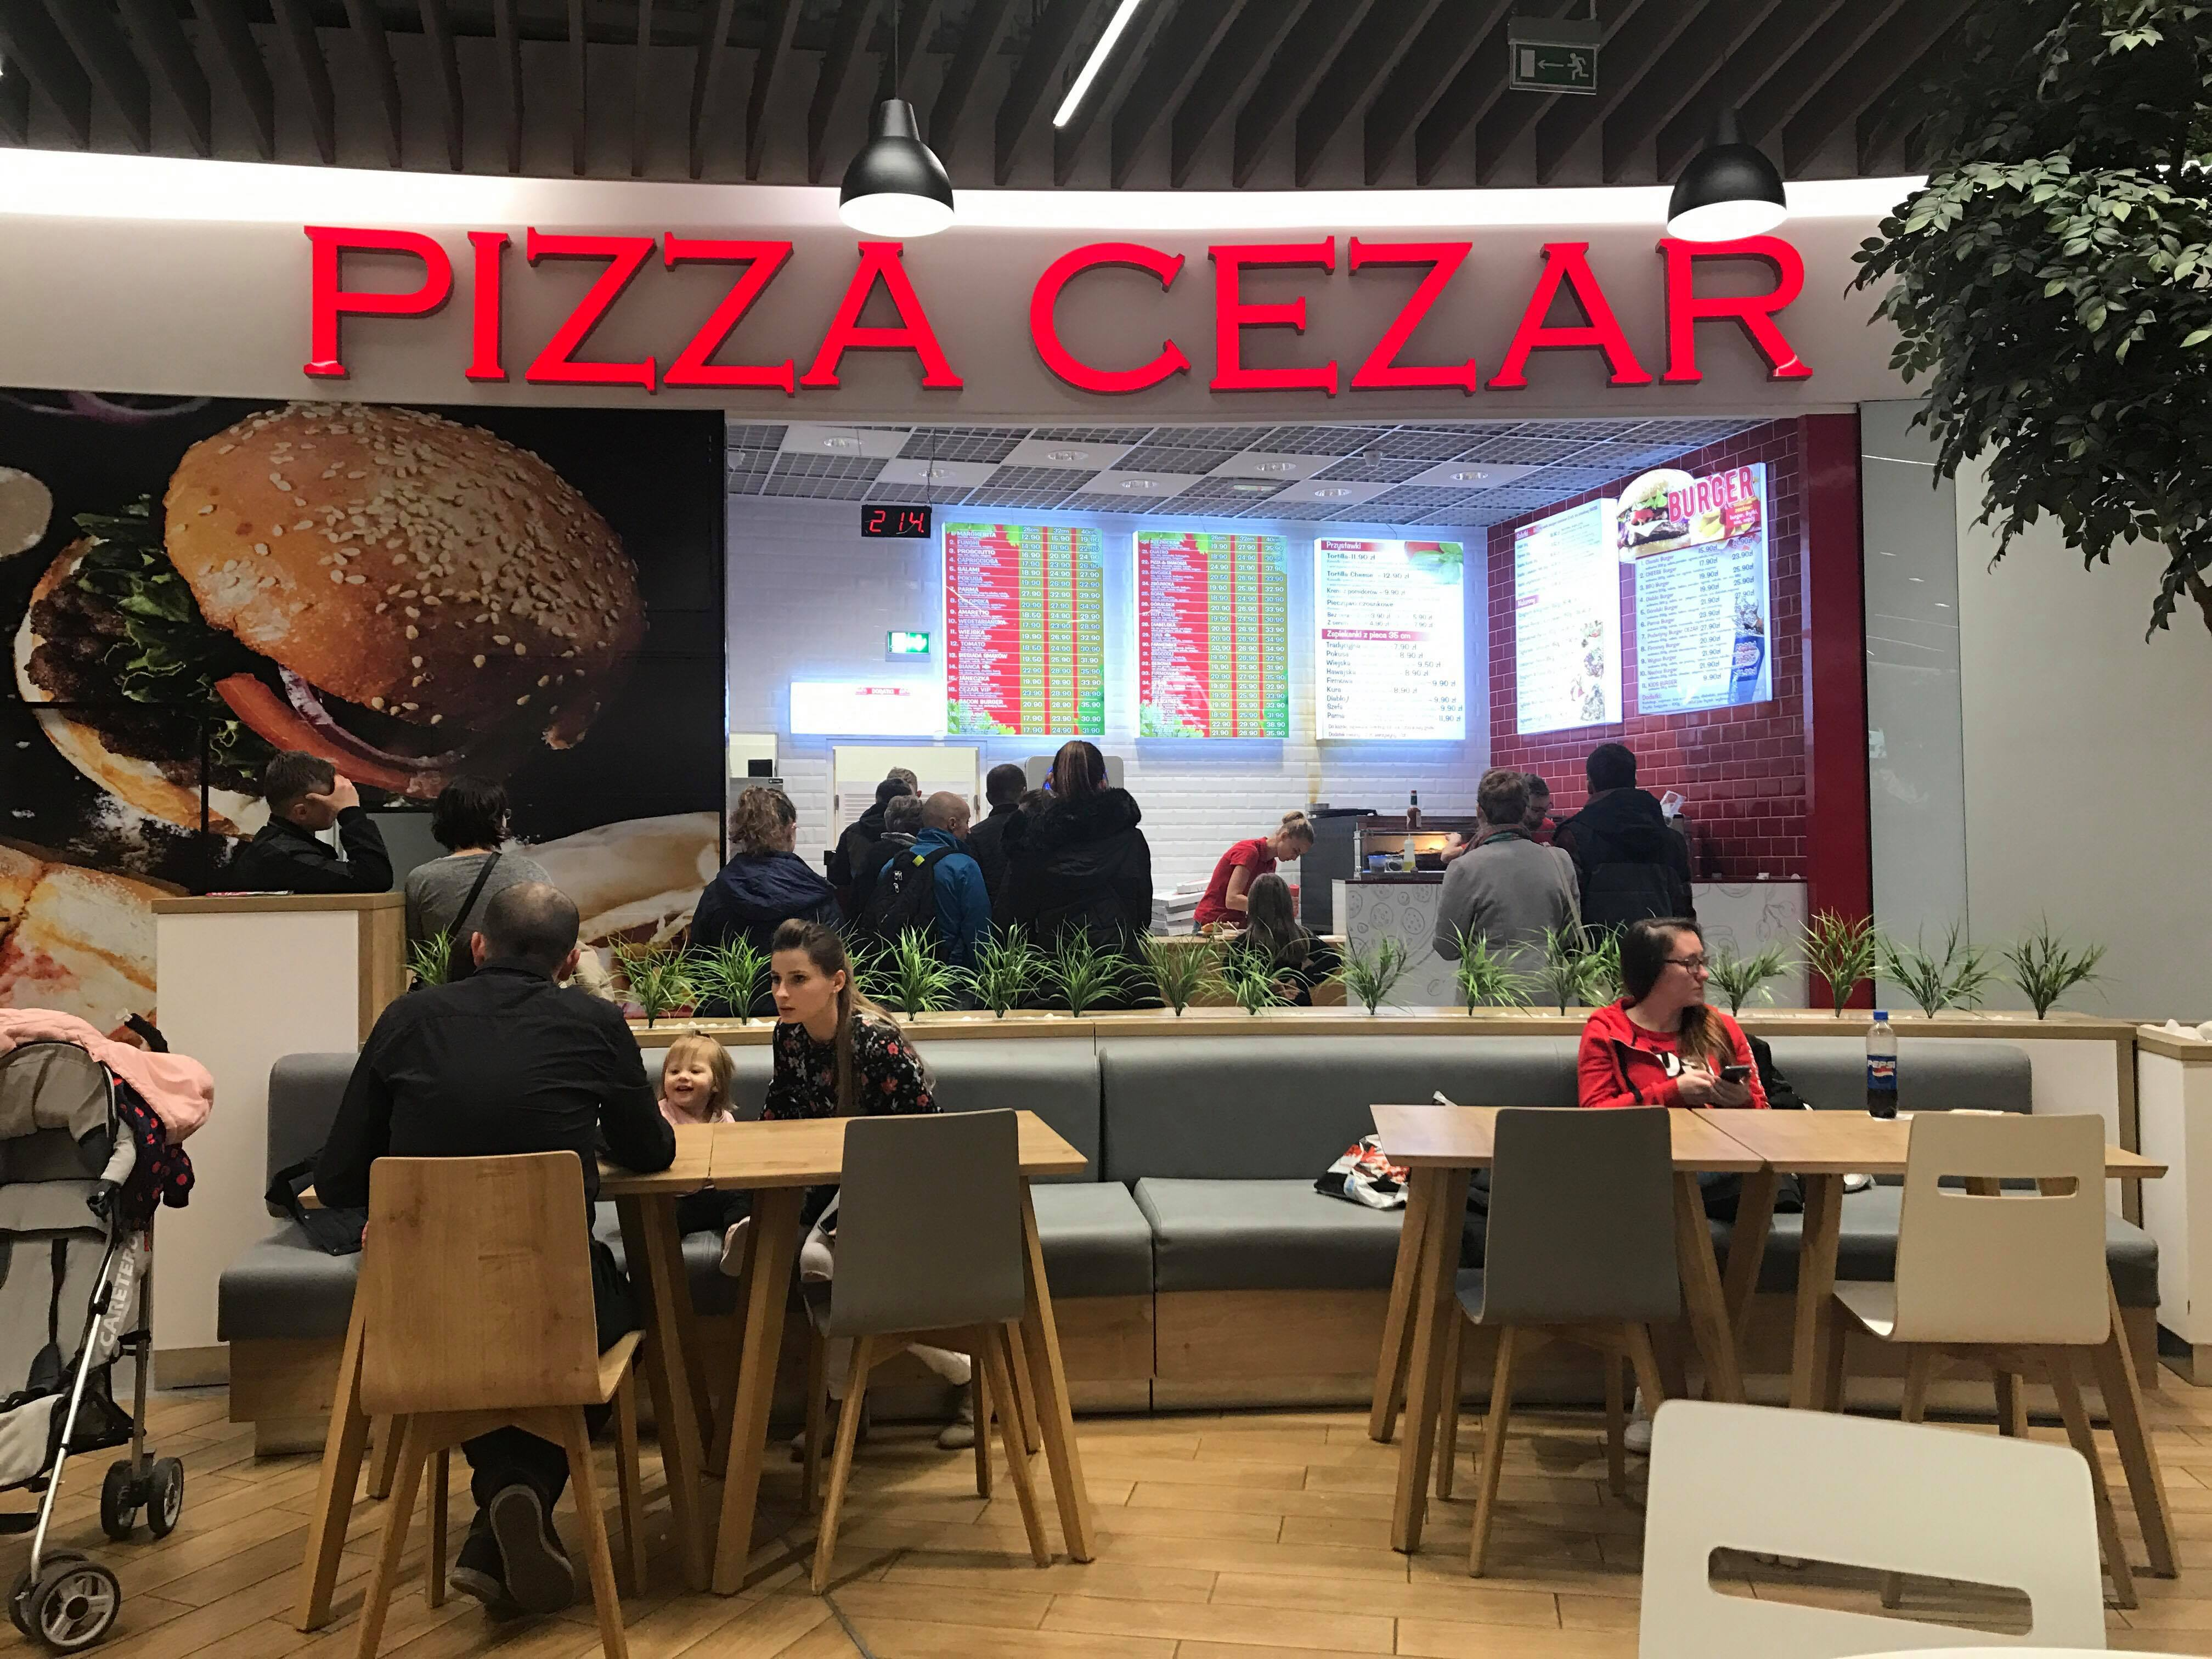 Pizza Cezar Mielec